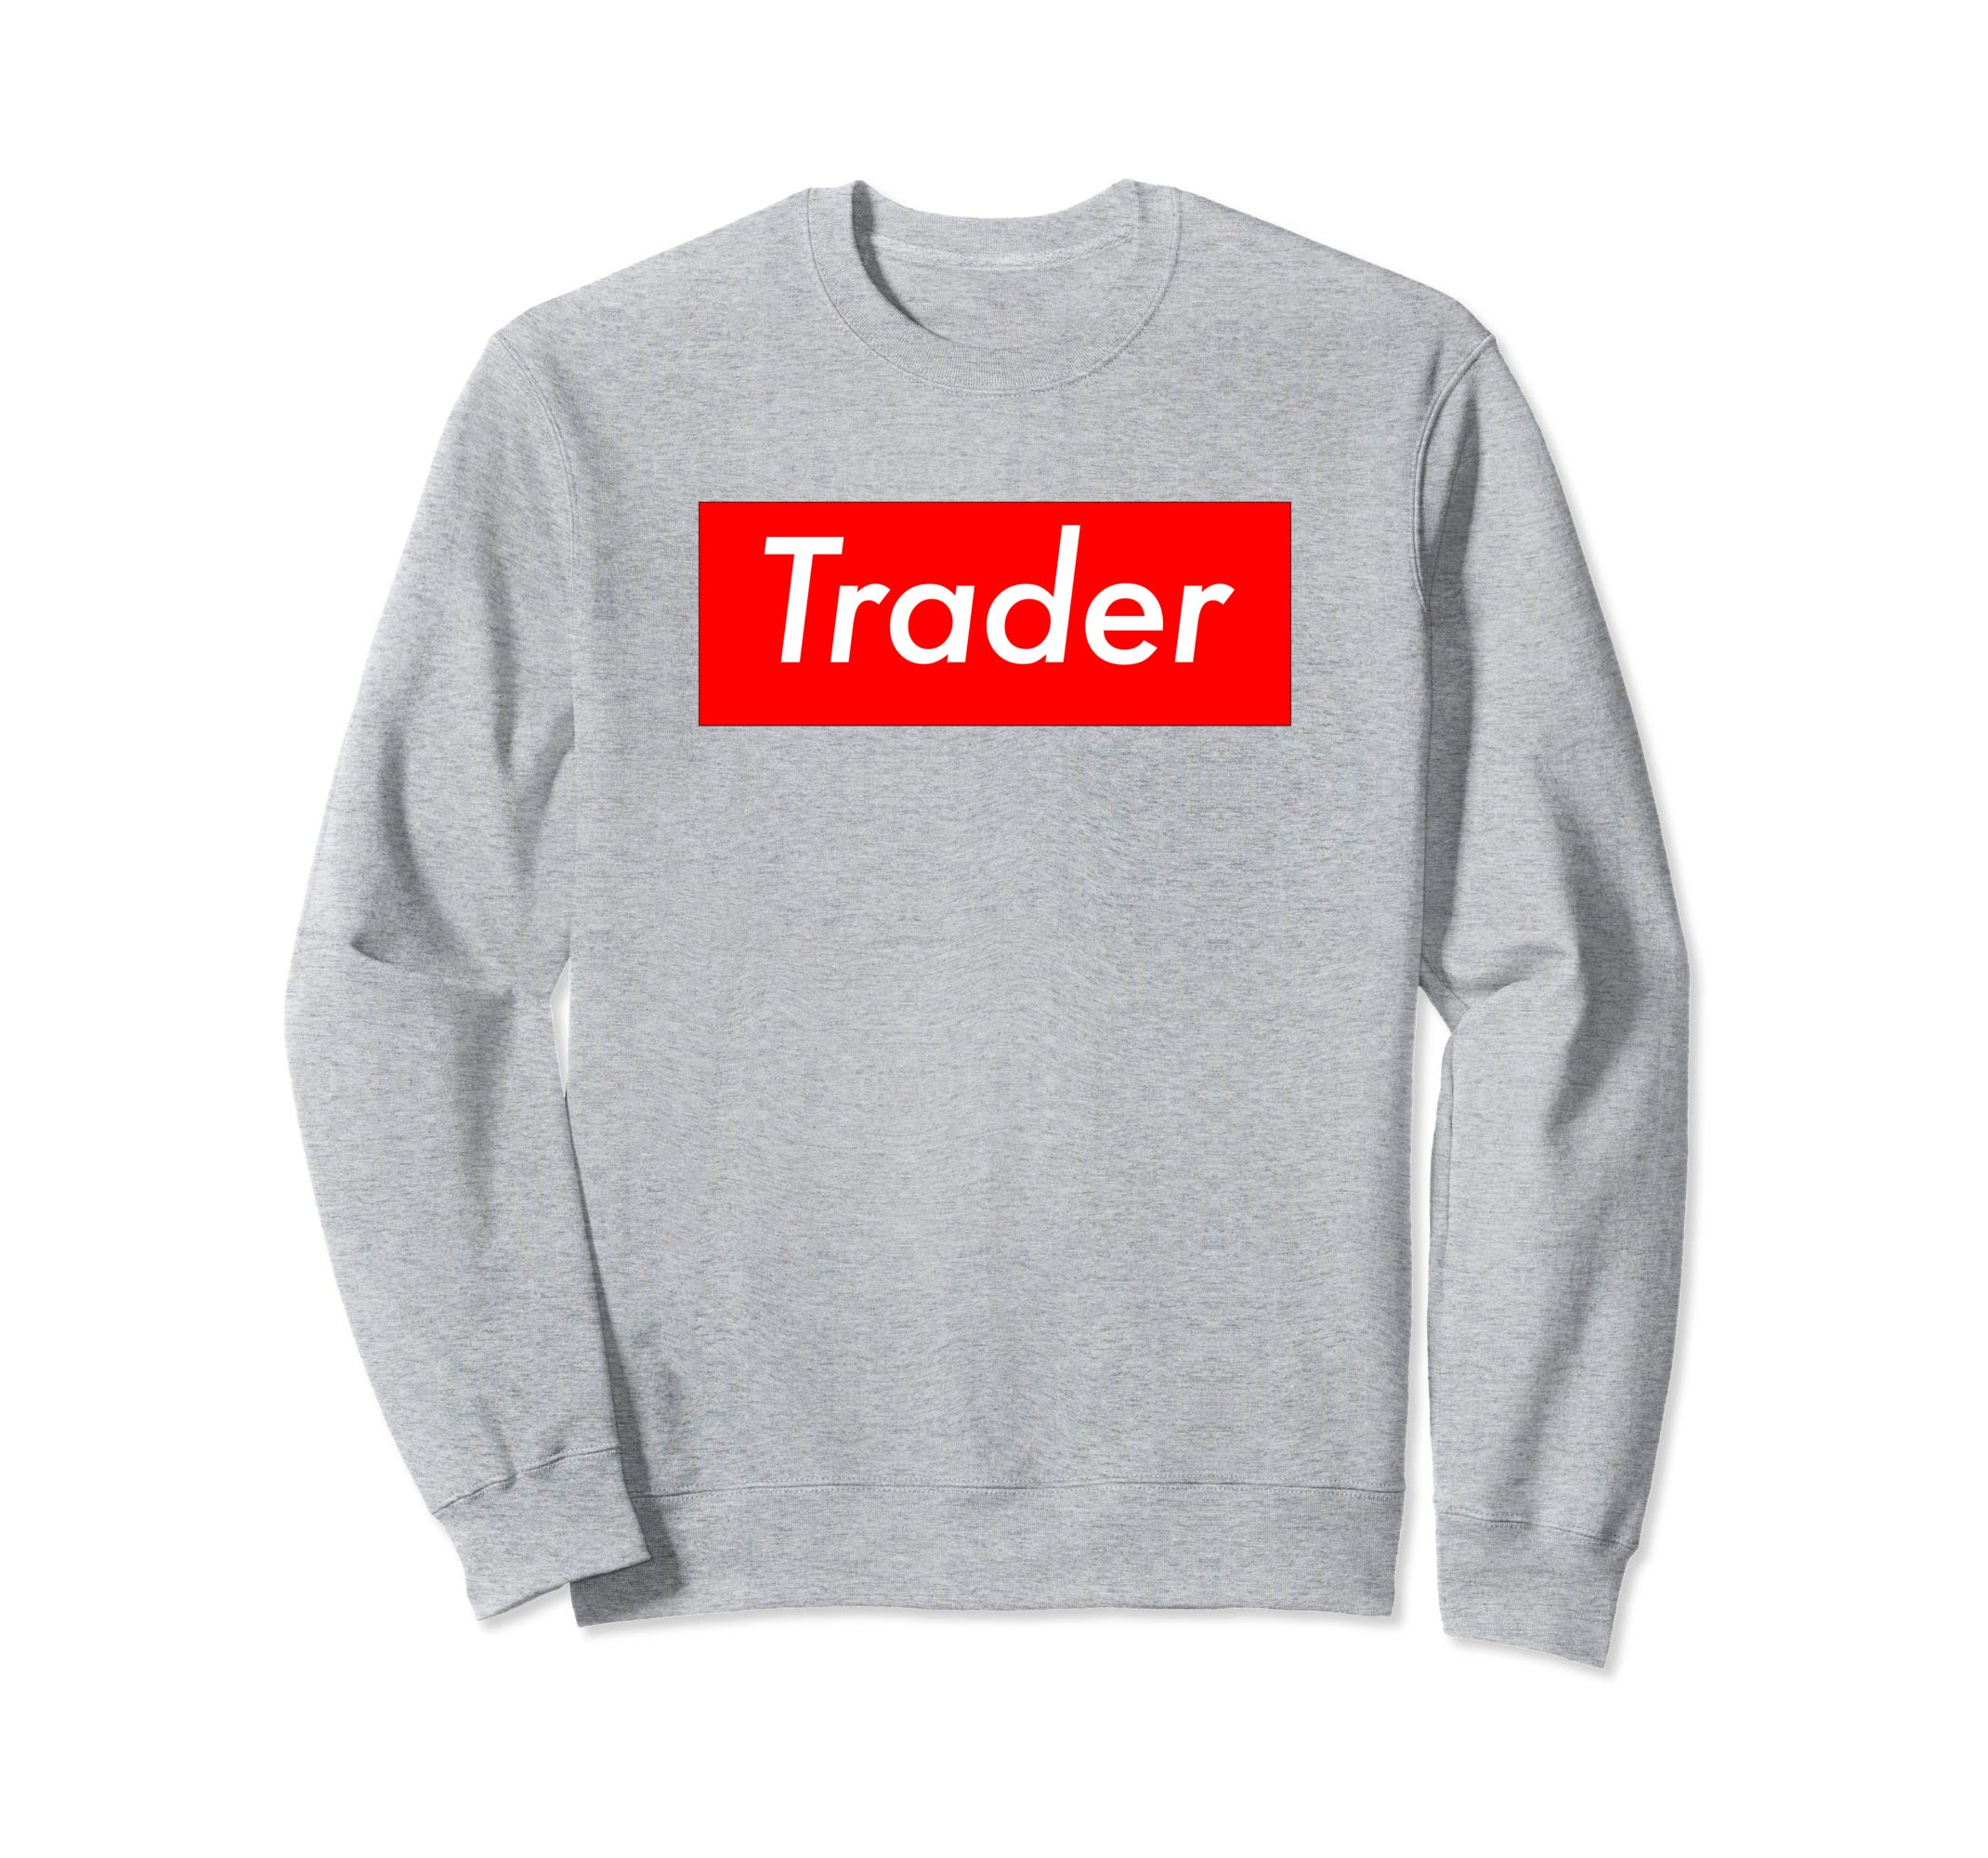 Trader sweatshirt